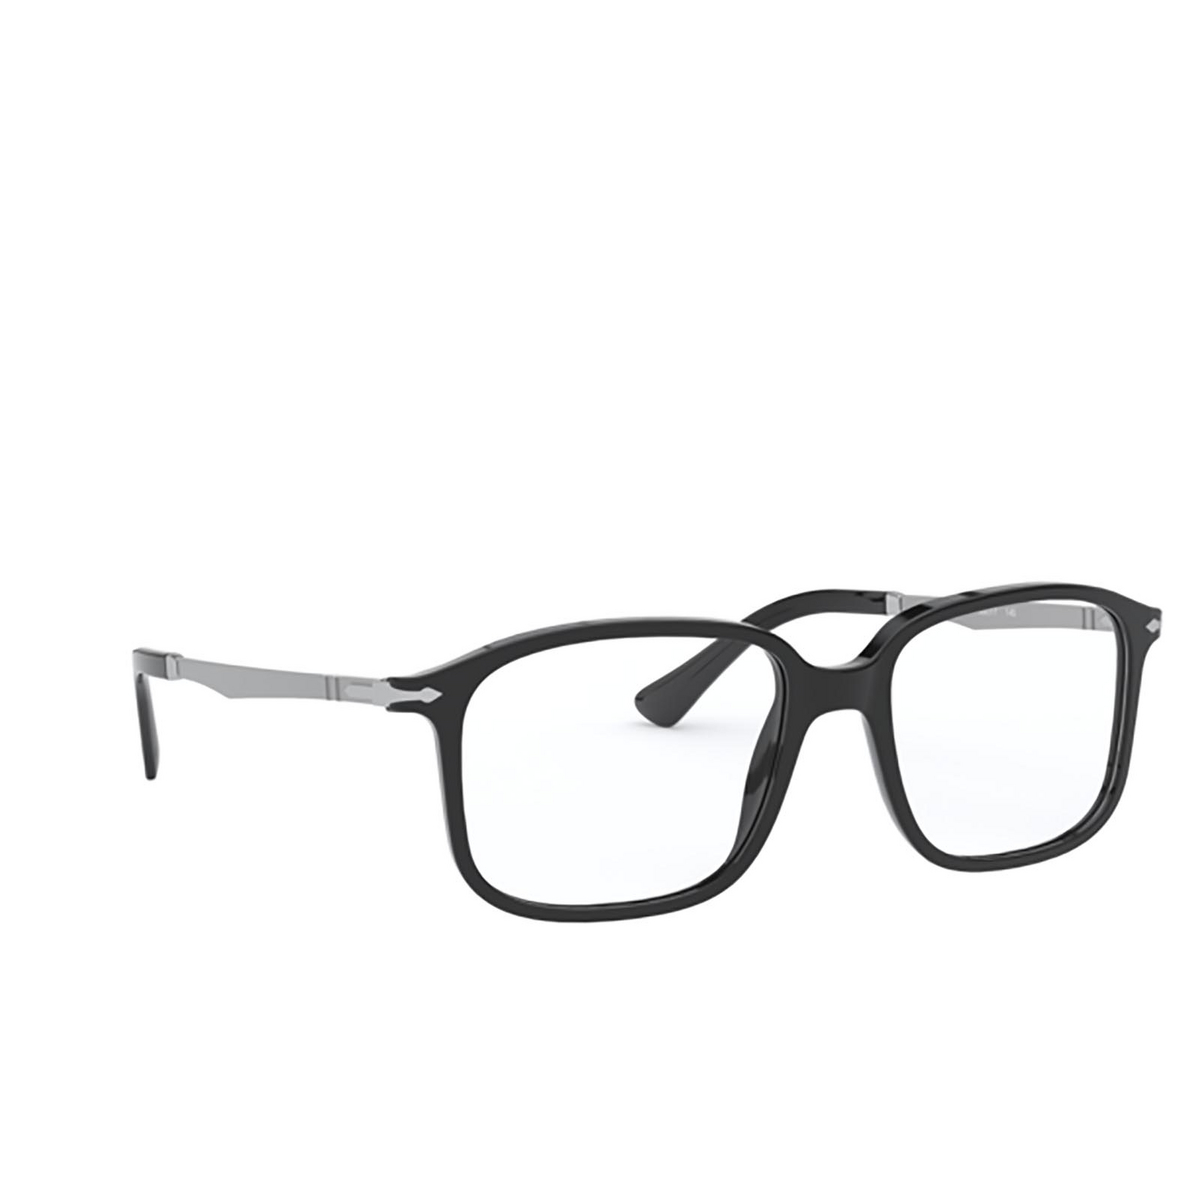 Persol® Rectangle Eyeglasses: PO3246V color Black 95 - three-quarters view.